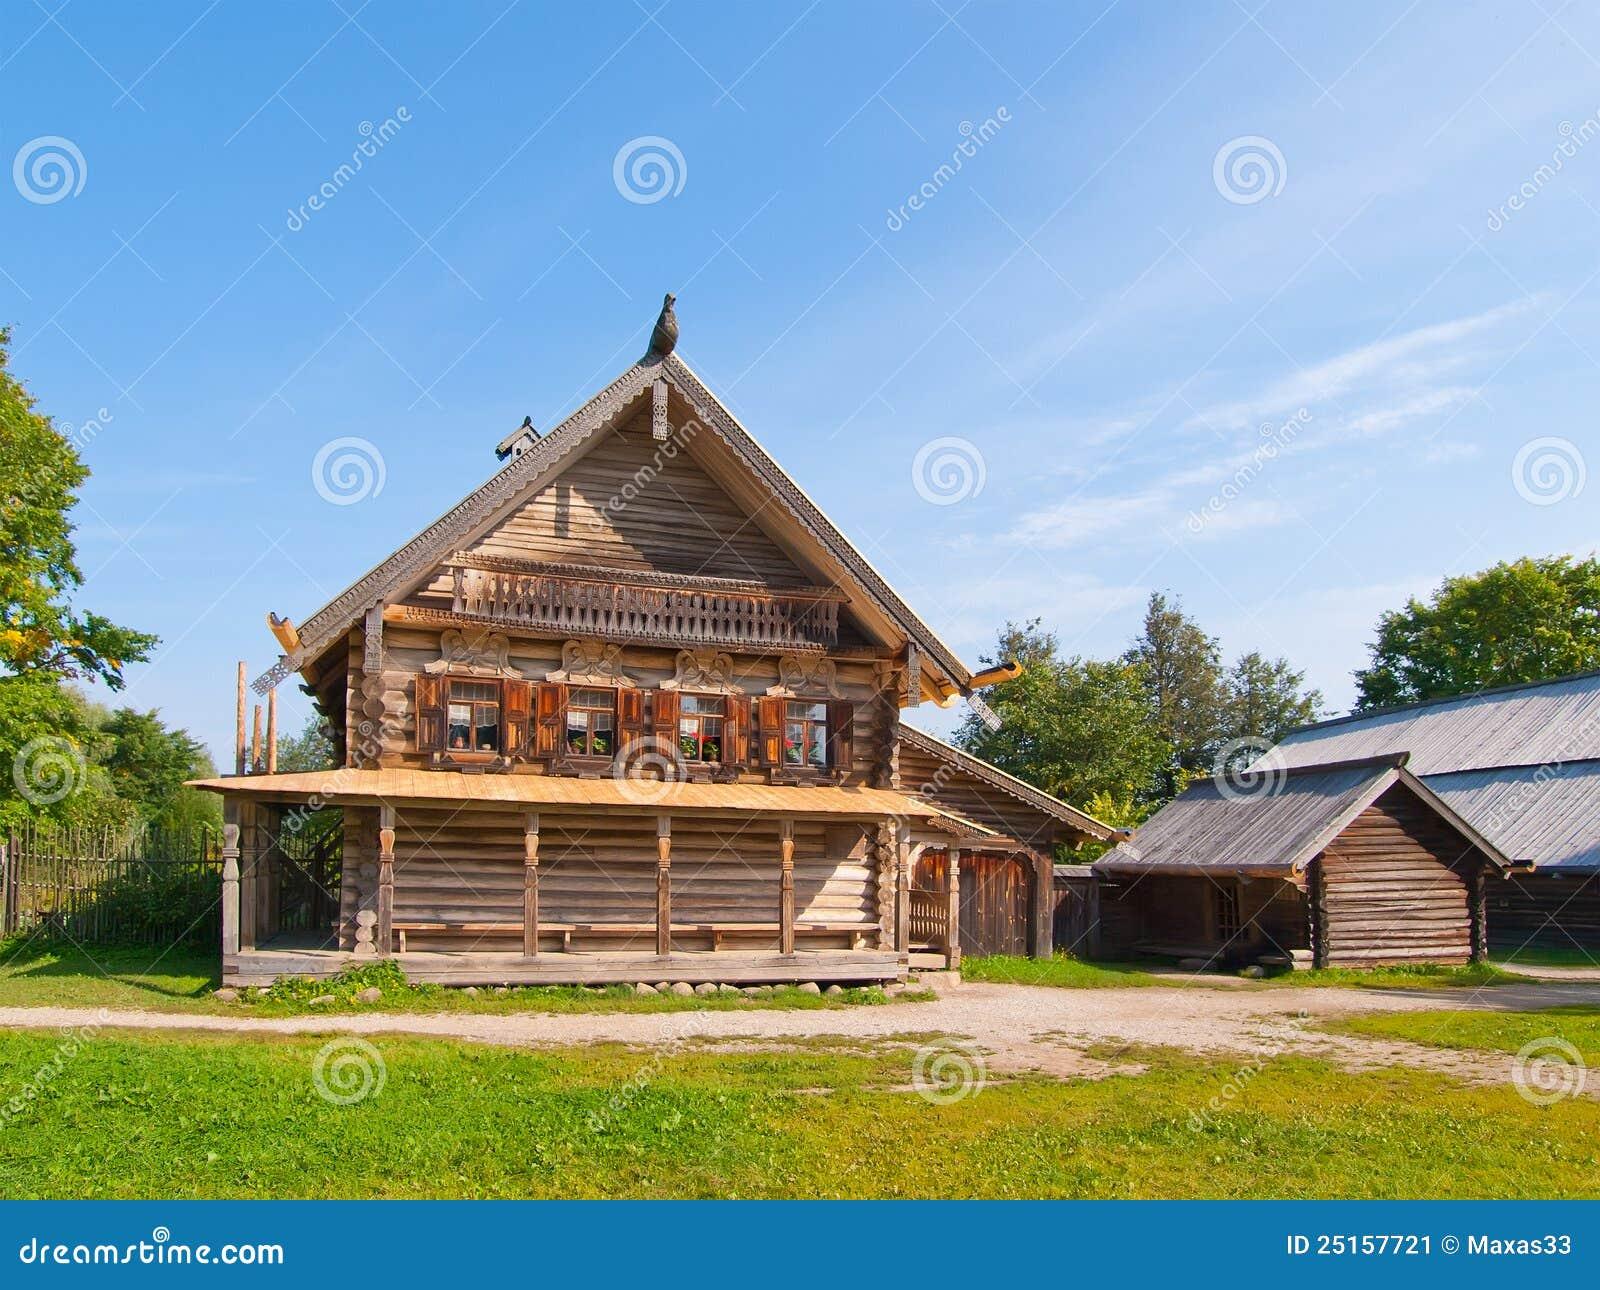 maison rurale en bois russe traditionnelle image stock image 25157721. Black Bedroom Furniture Sets. Home Design Ideas